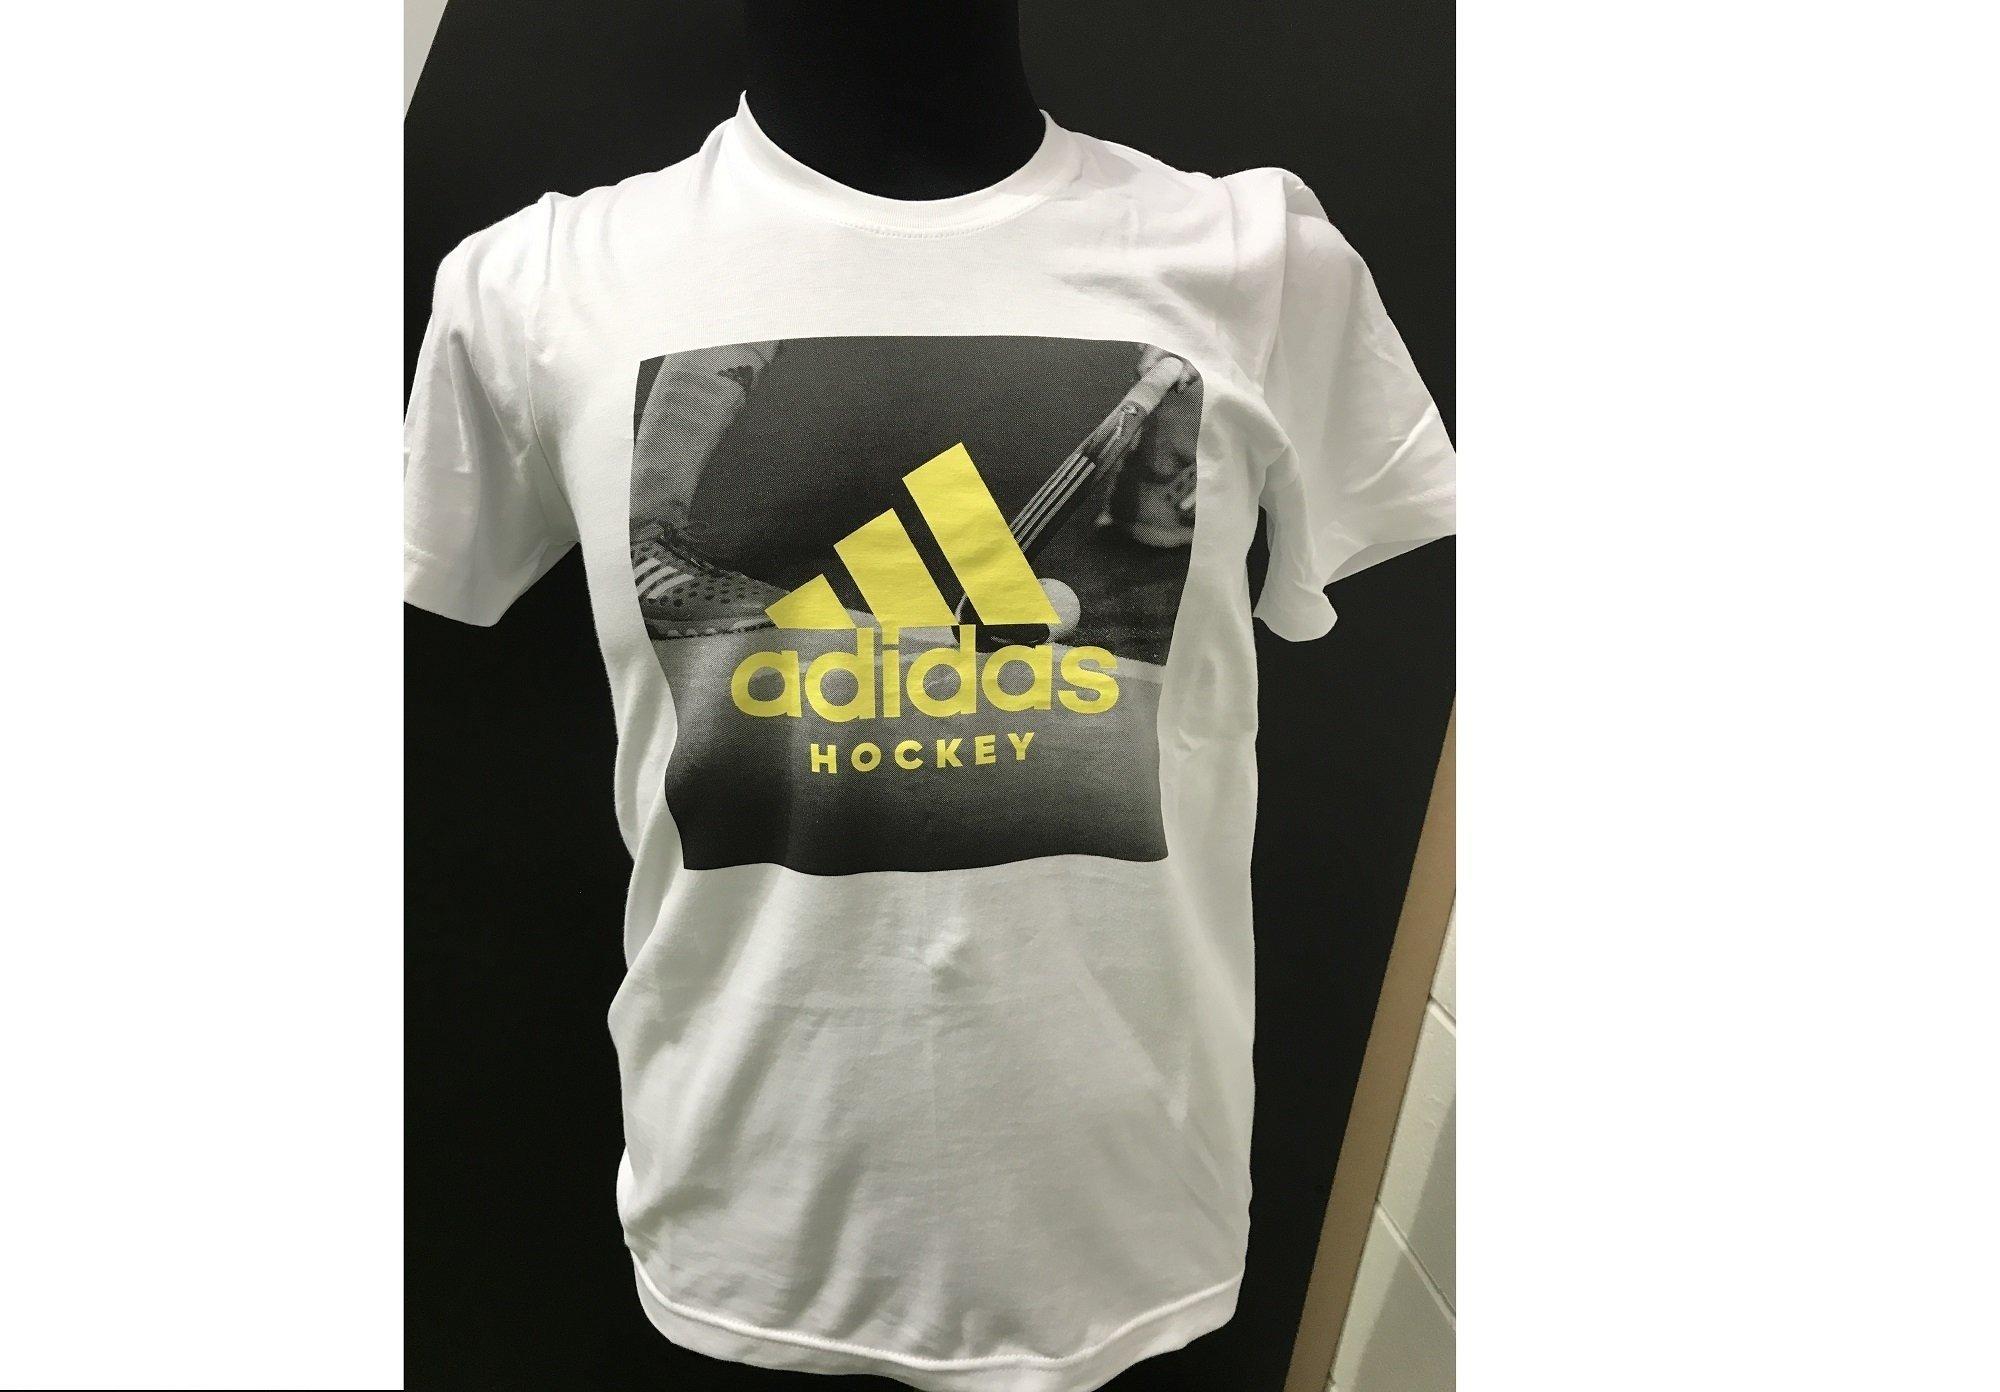 Adidas Hockey Graphic T-Shirt